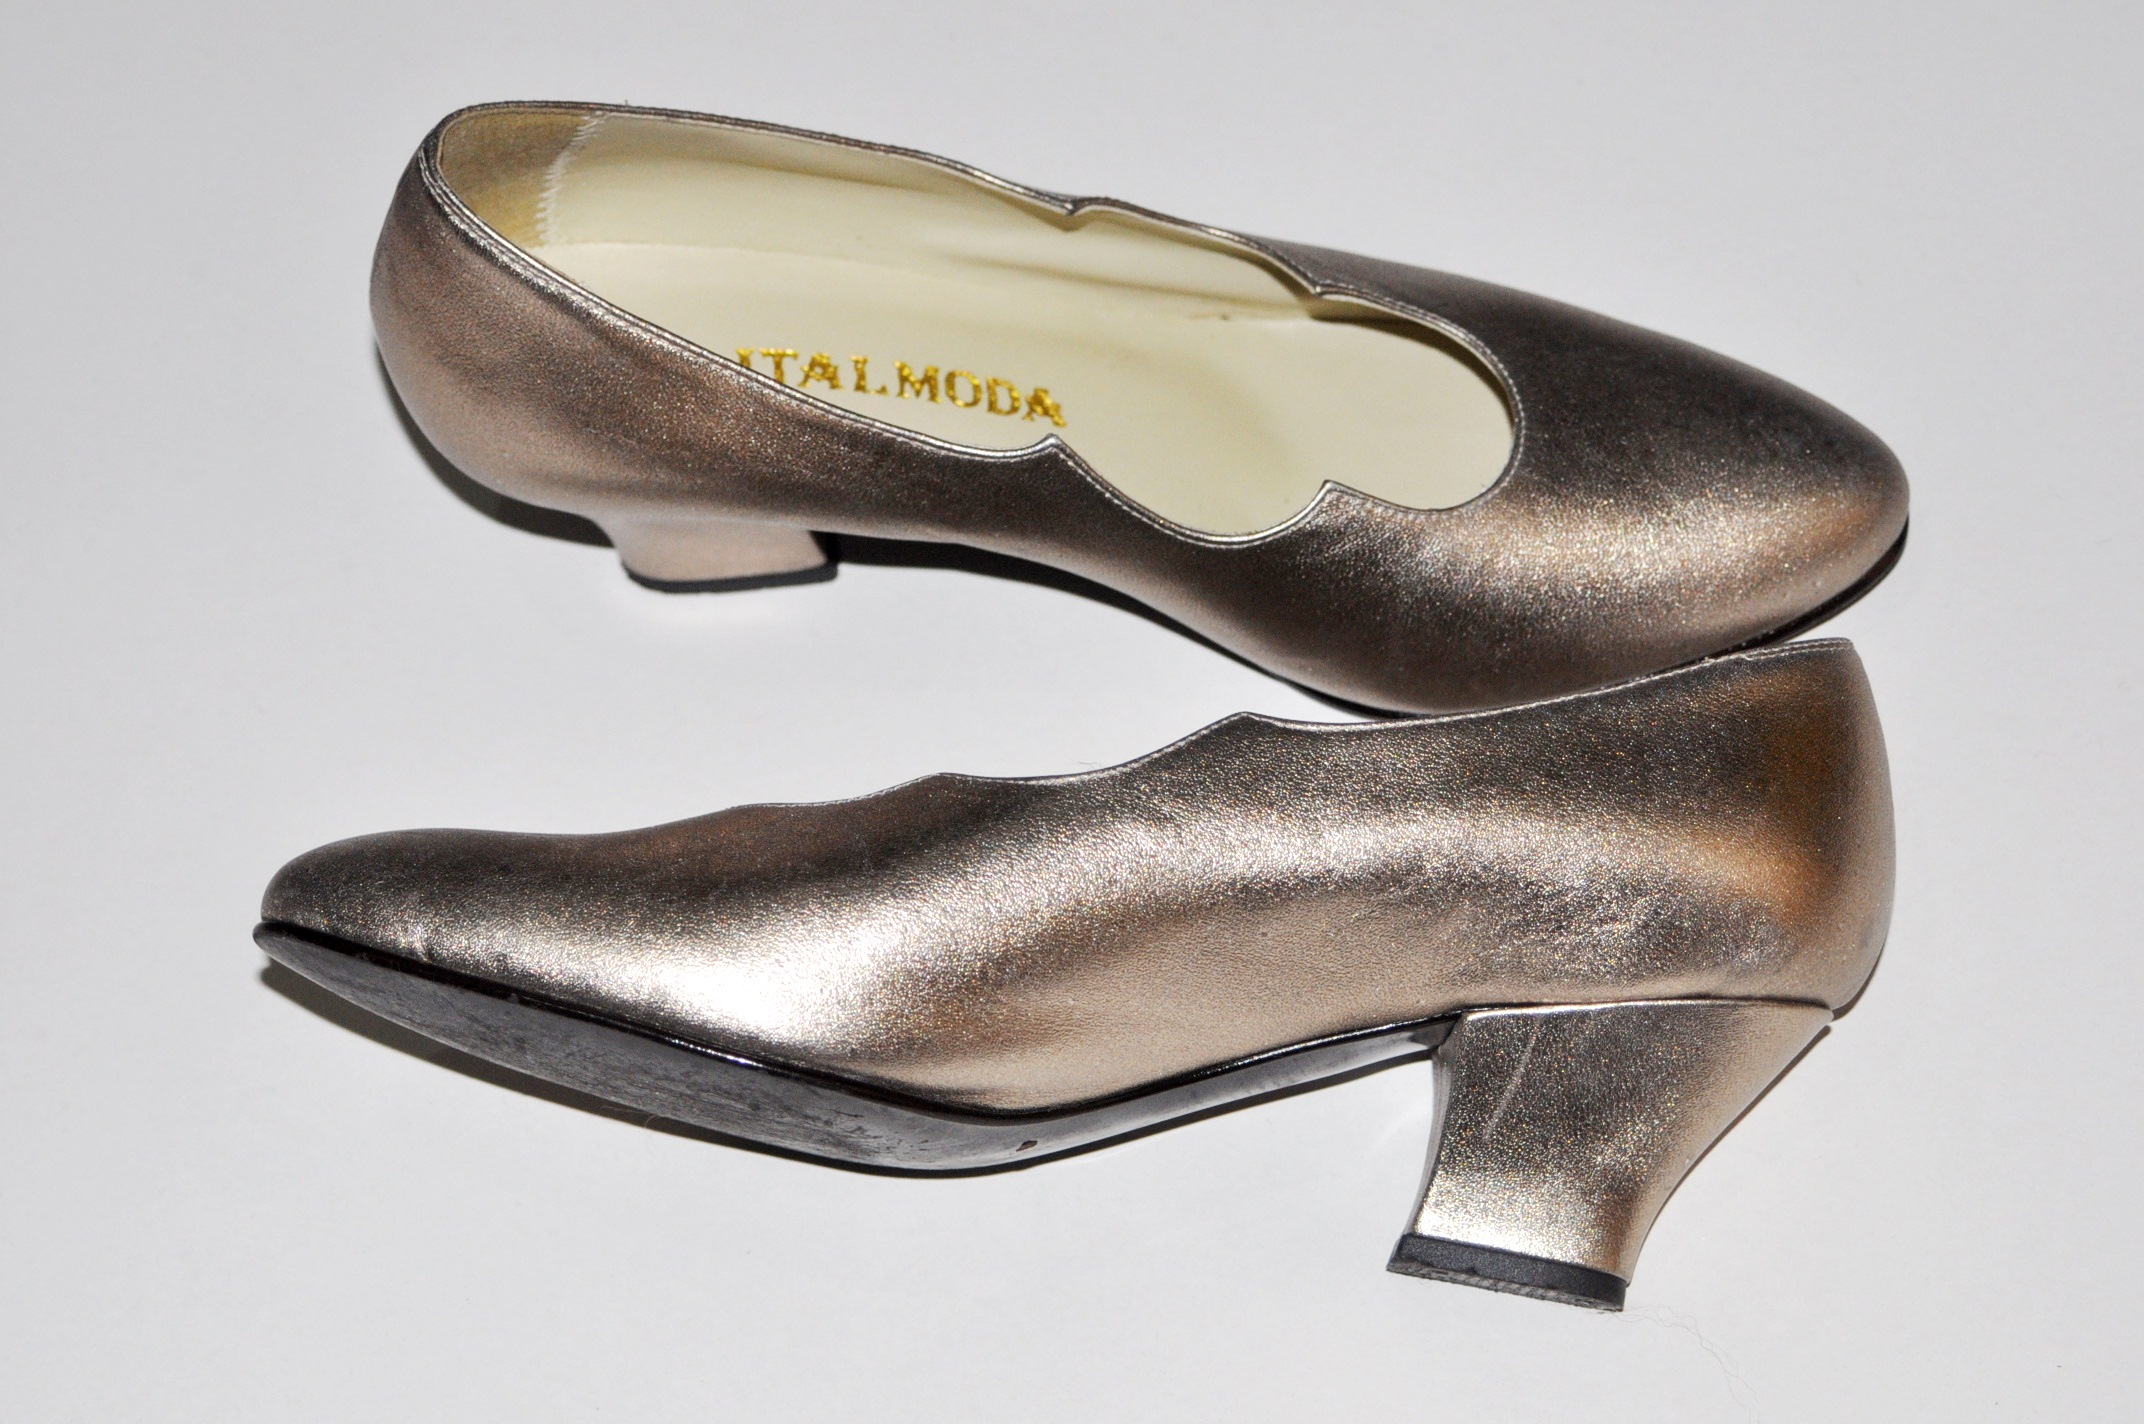 Sapato metalizado 36